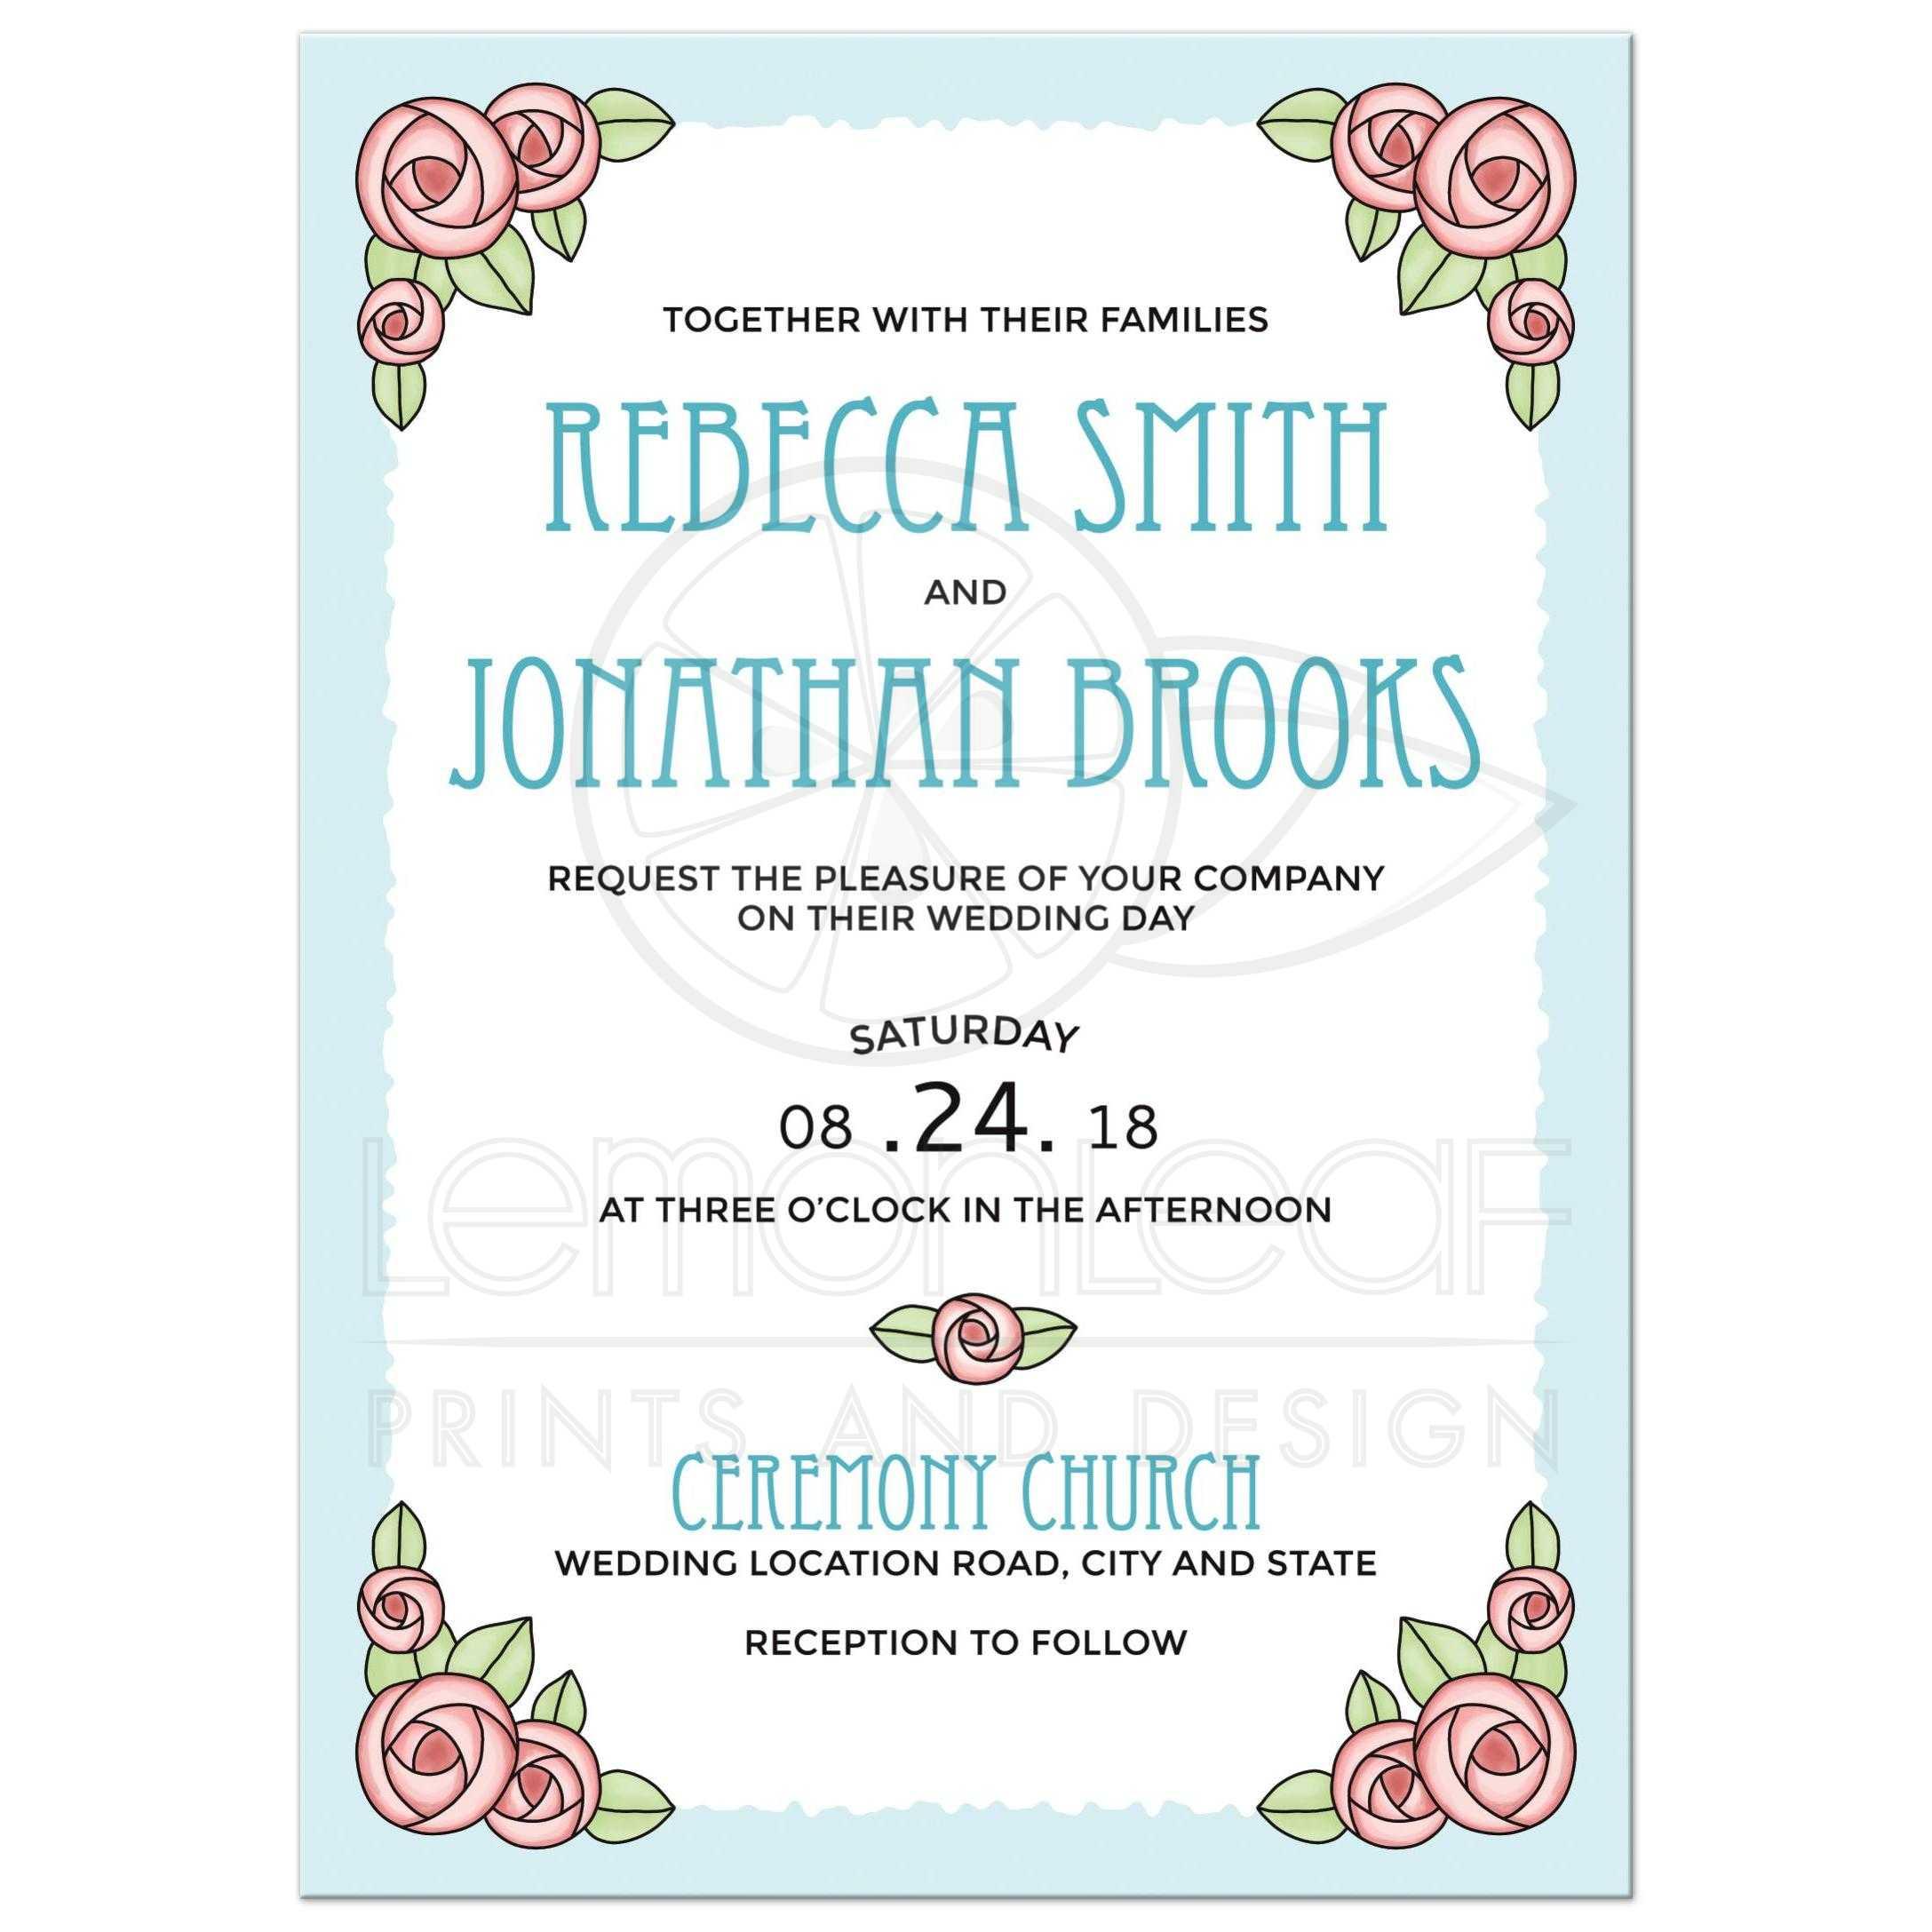 Romantic rose wedding invitations   Pretty, floral design in pink ...